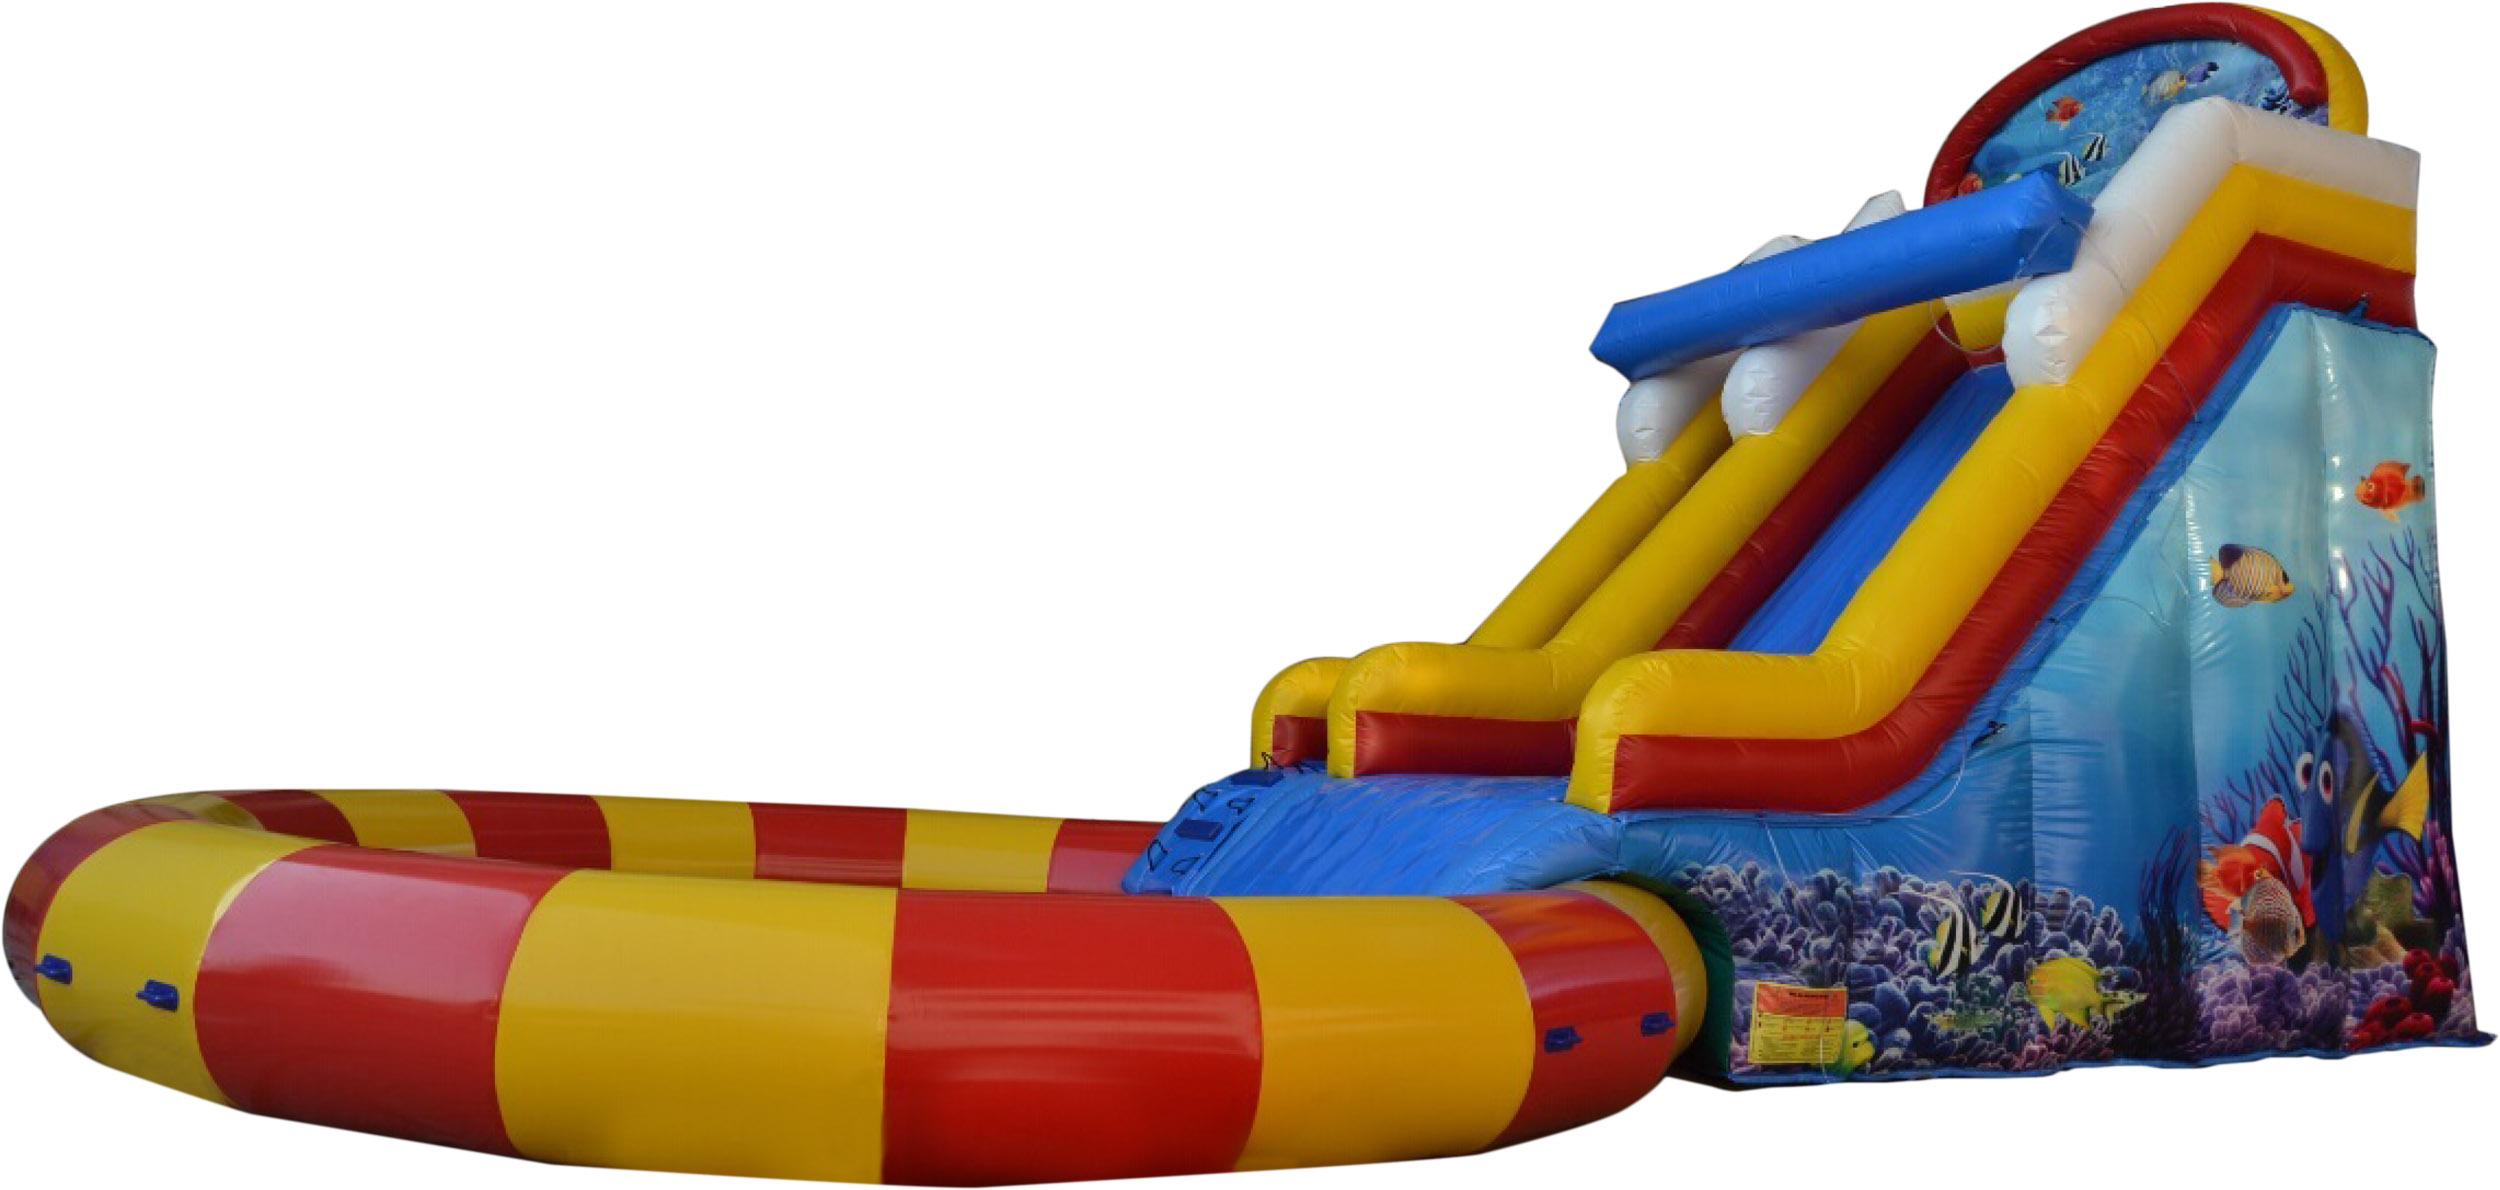 nemo-slide